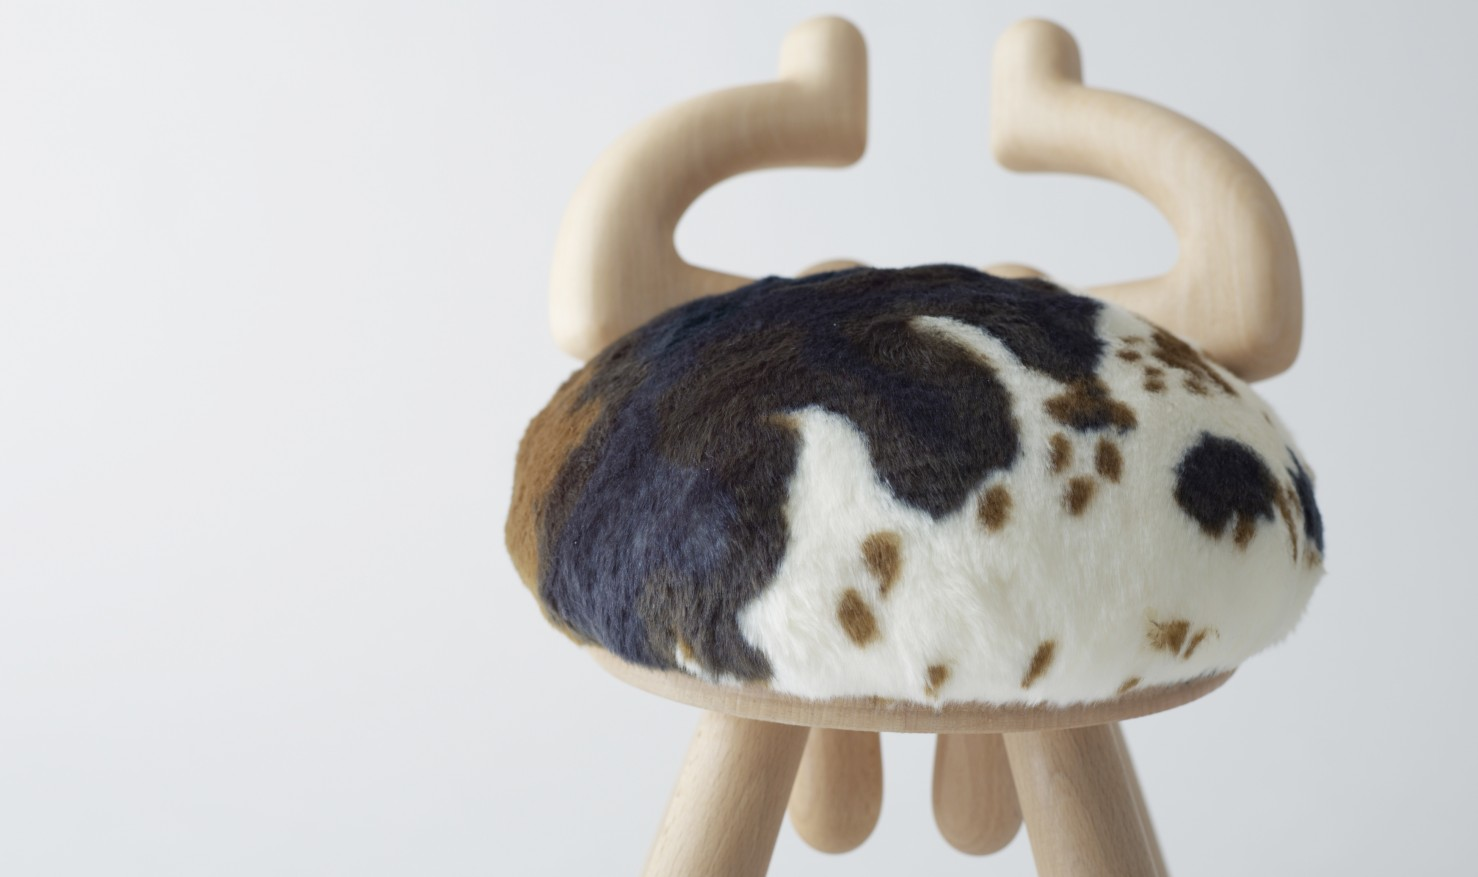 cow chair/sheep chair by kamina&C / kamina&C